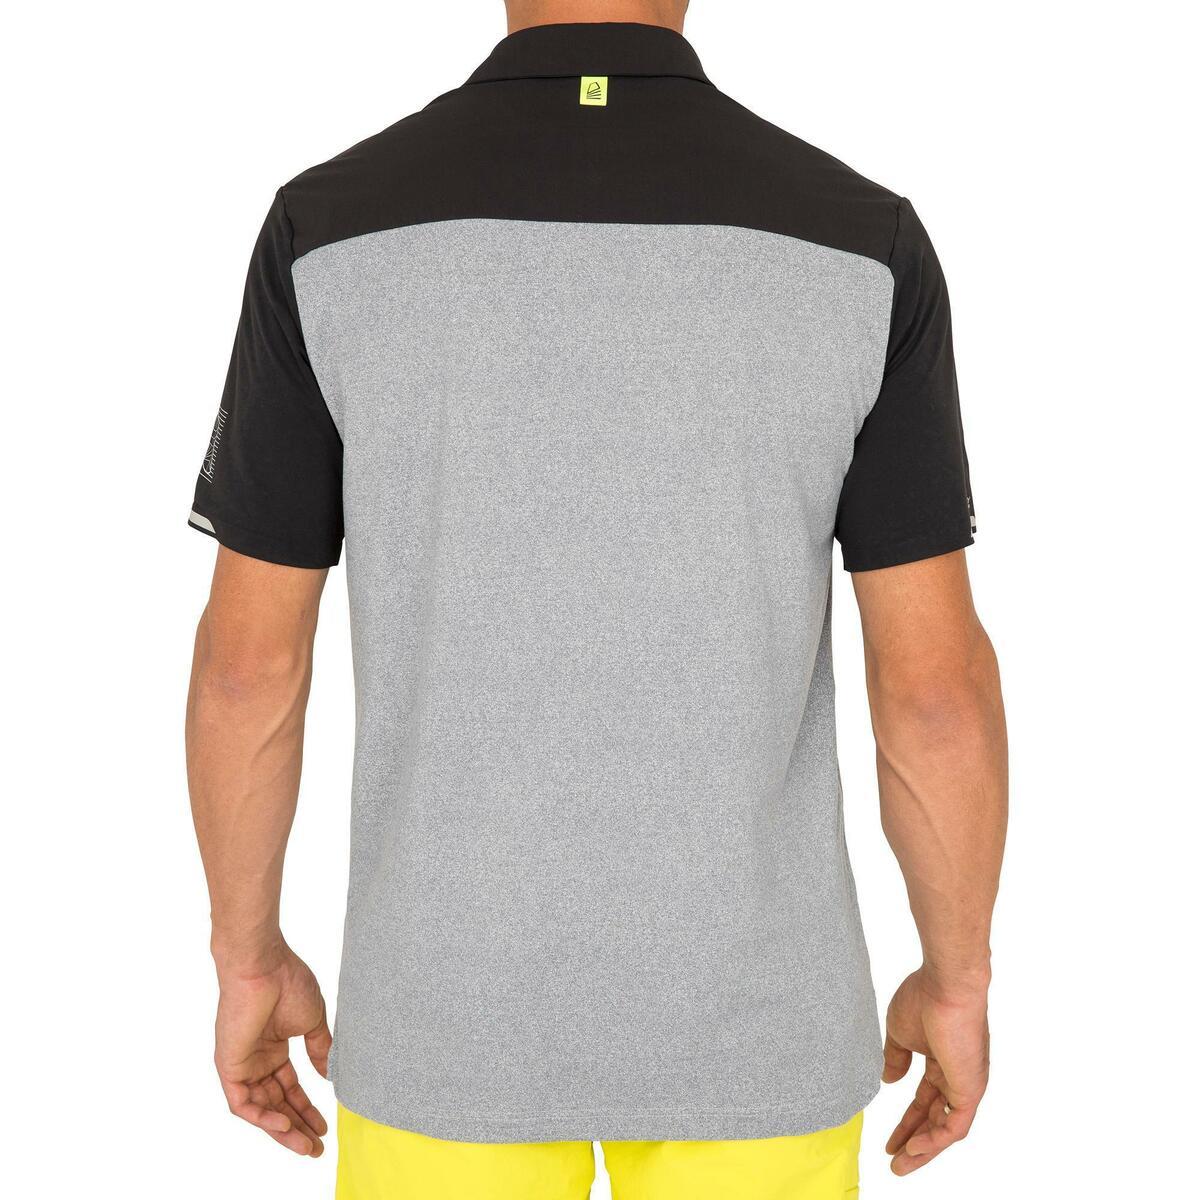 Bild 5 von Poloshirt kurzarm Segeln Race Herren grau meliert